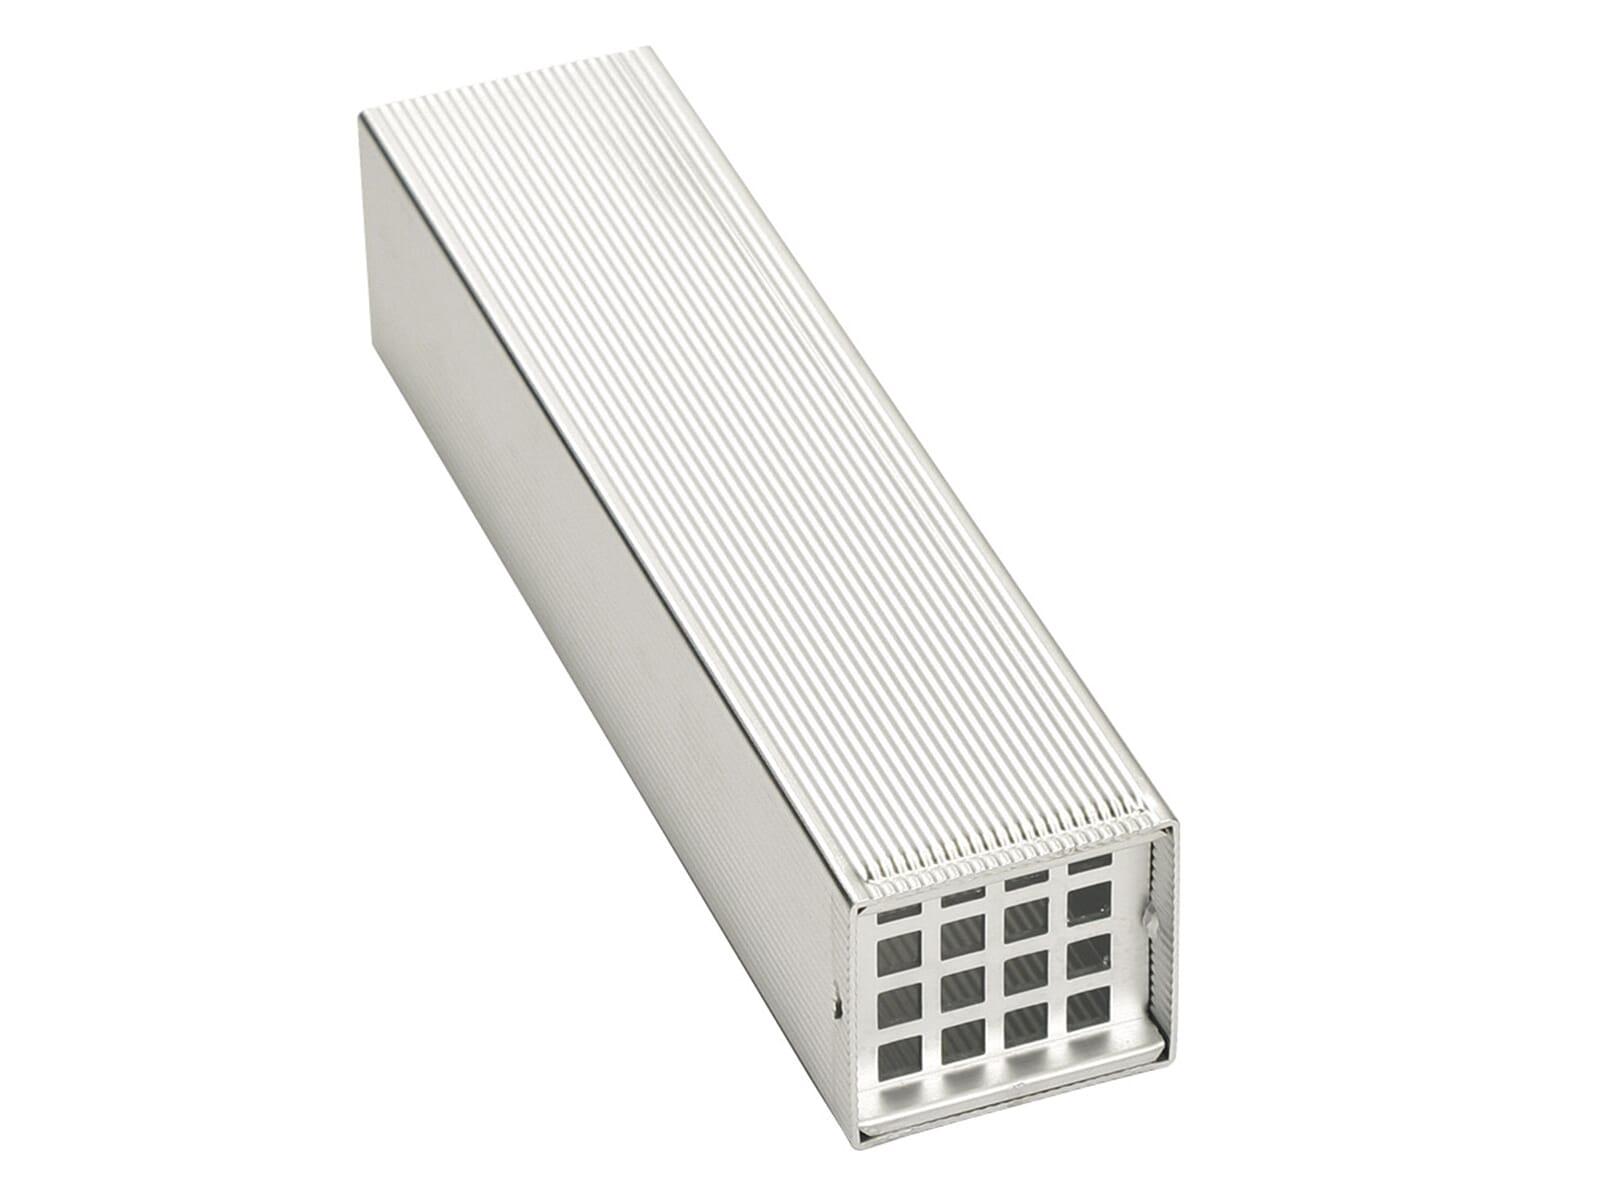 Siemens SZ73001 Silberbesteck-Kassette